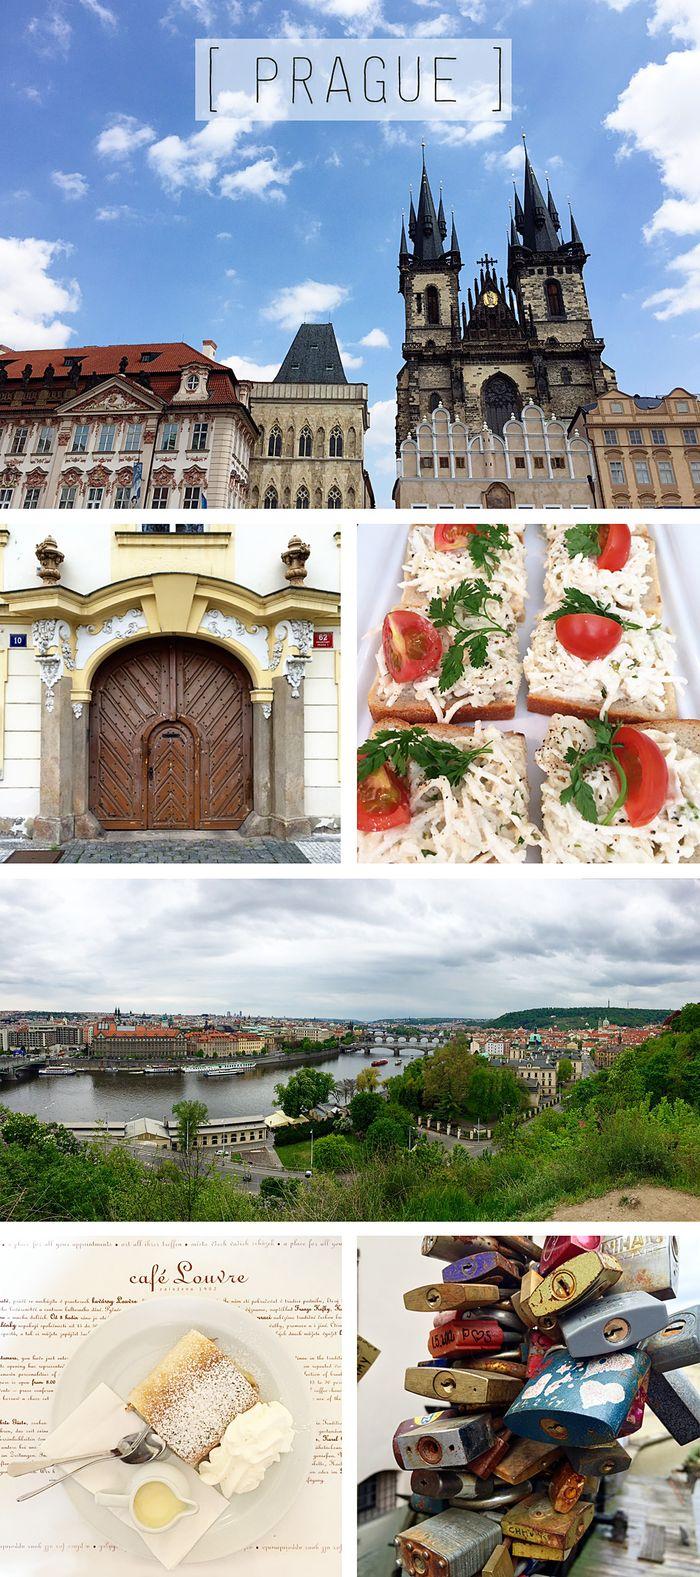 Prague photos by carolyn peeler